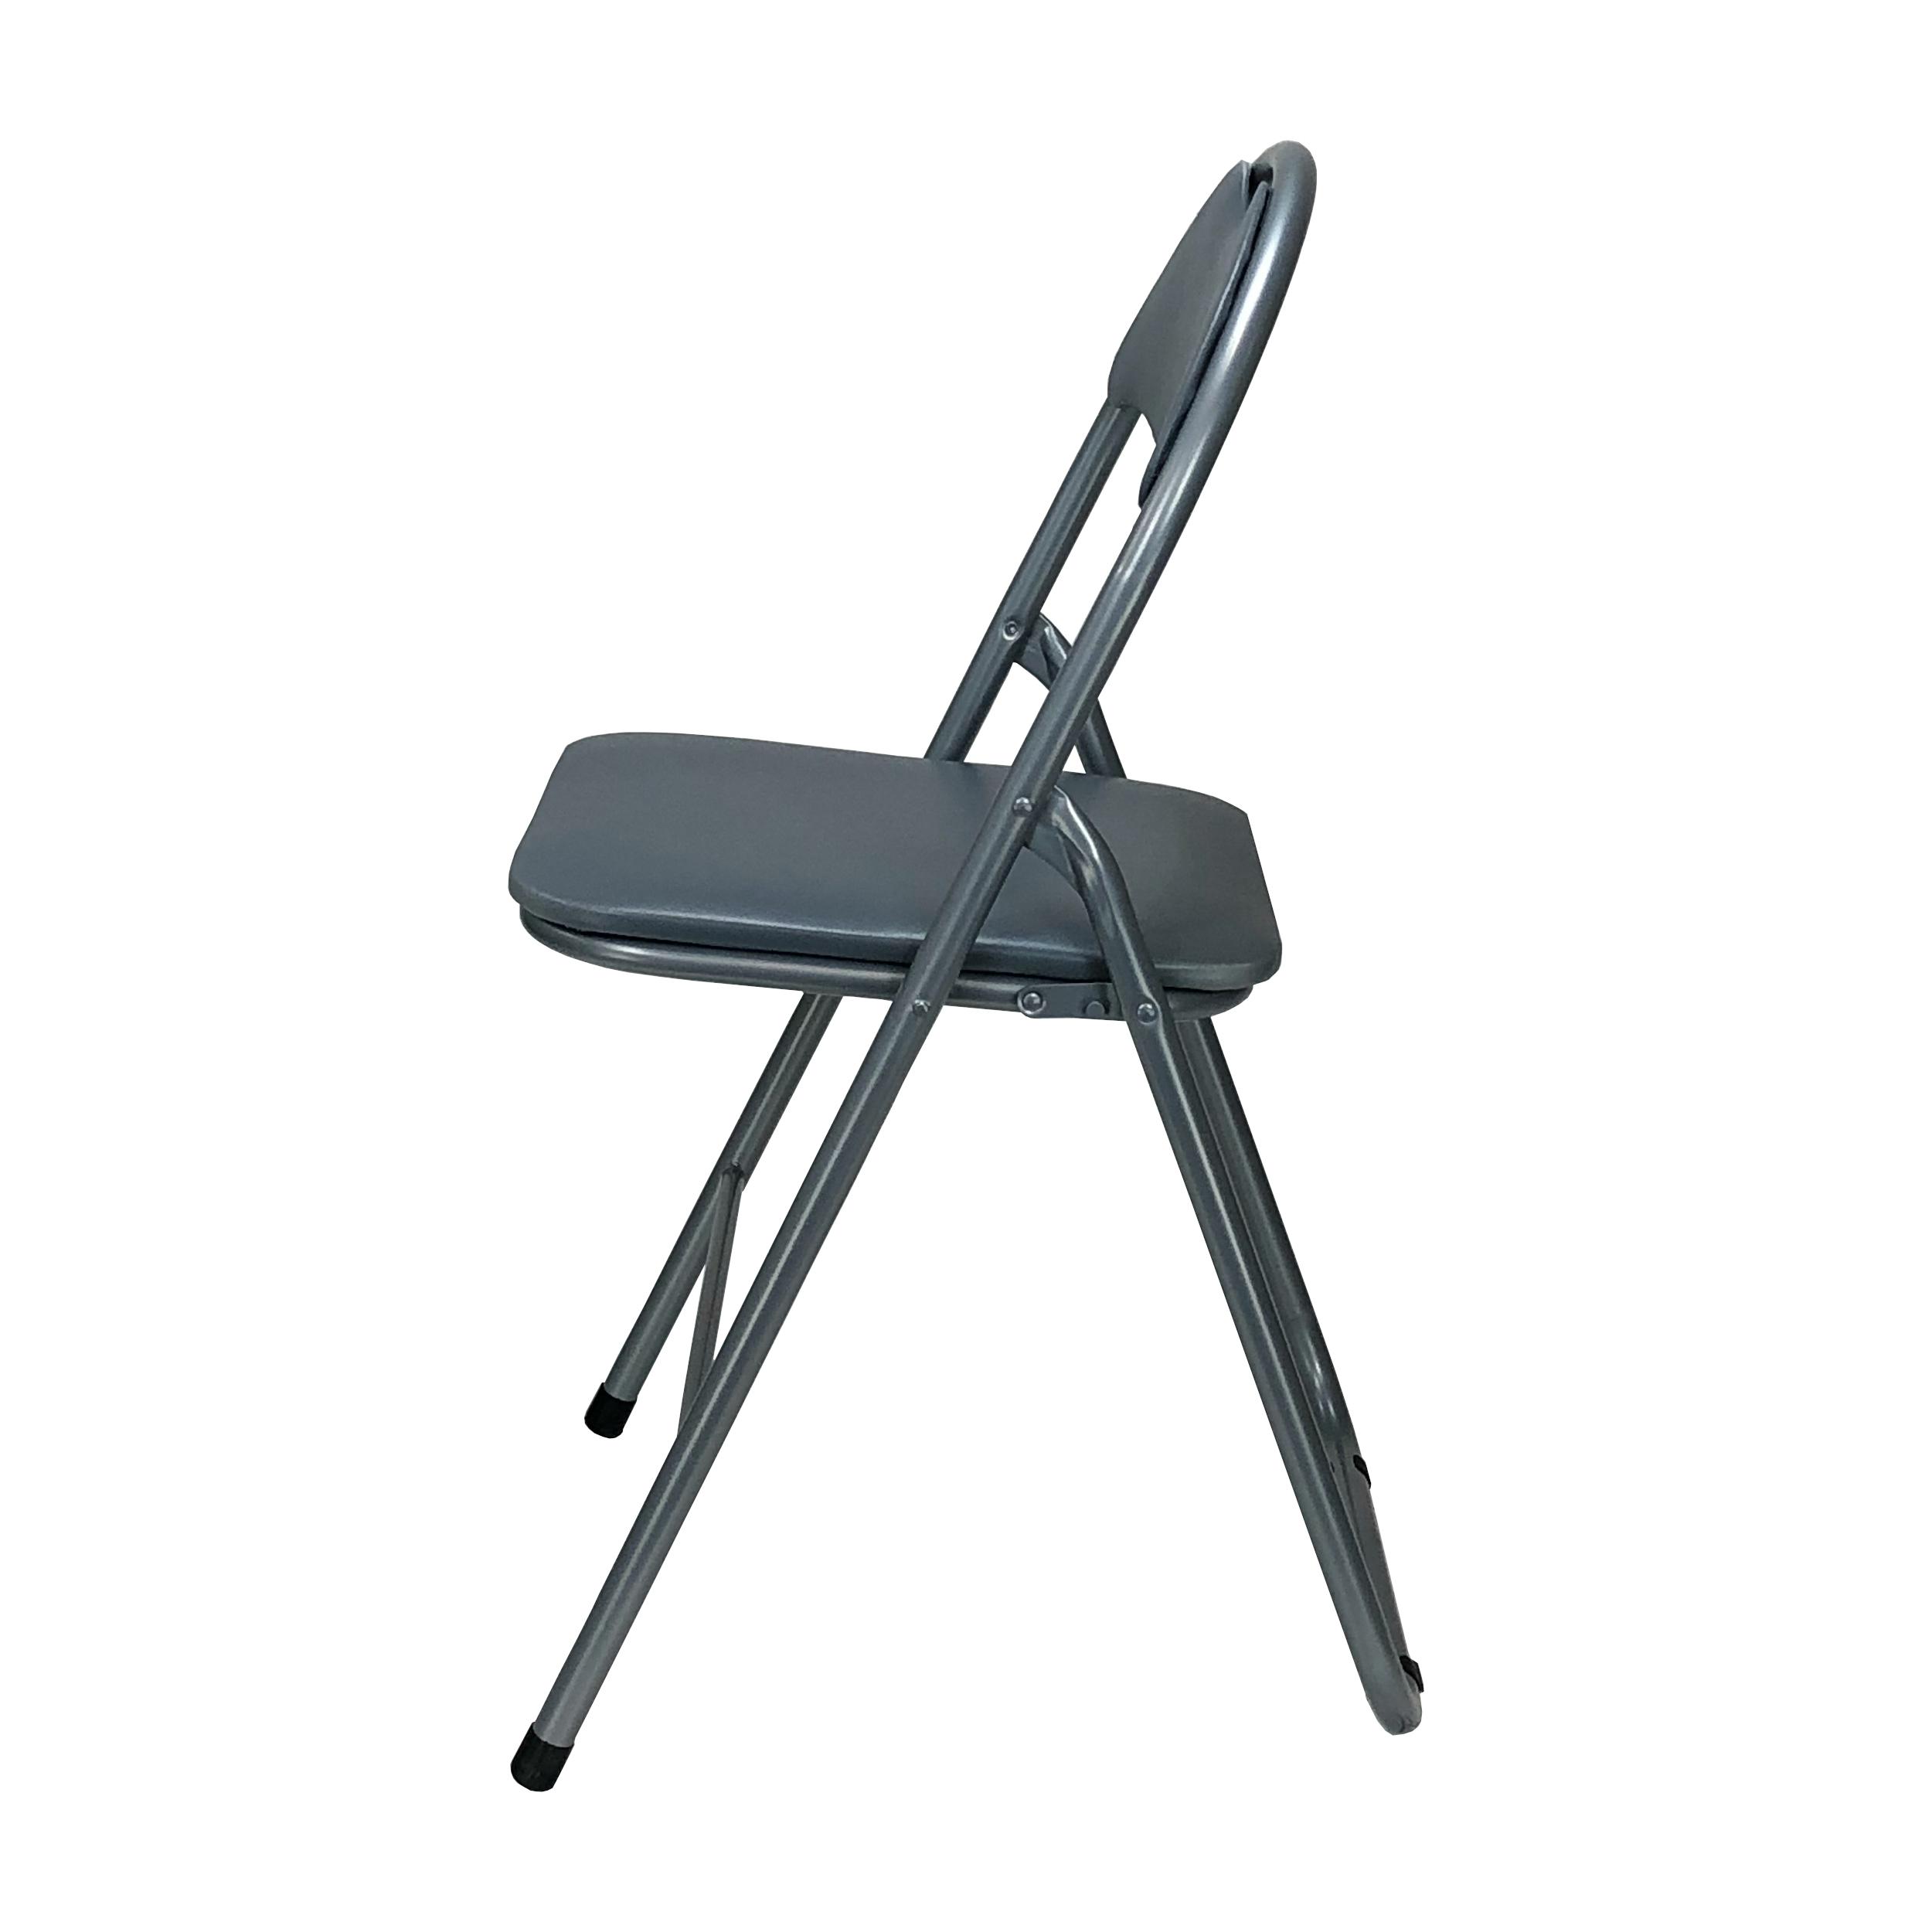 Sedia Pieghevole In Metallo Imbottita Ecopelle Design Salvaspazio Vari Colori Ebay